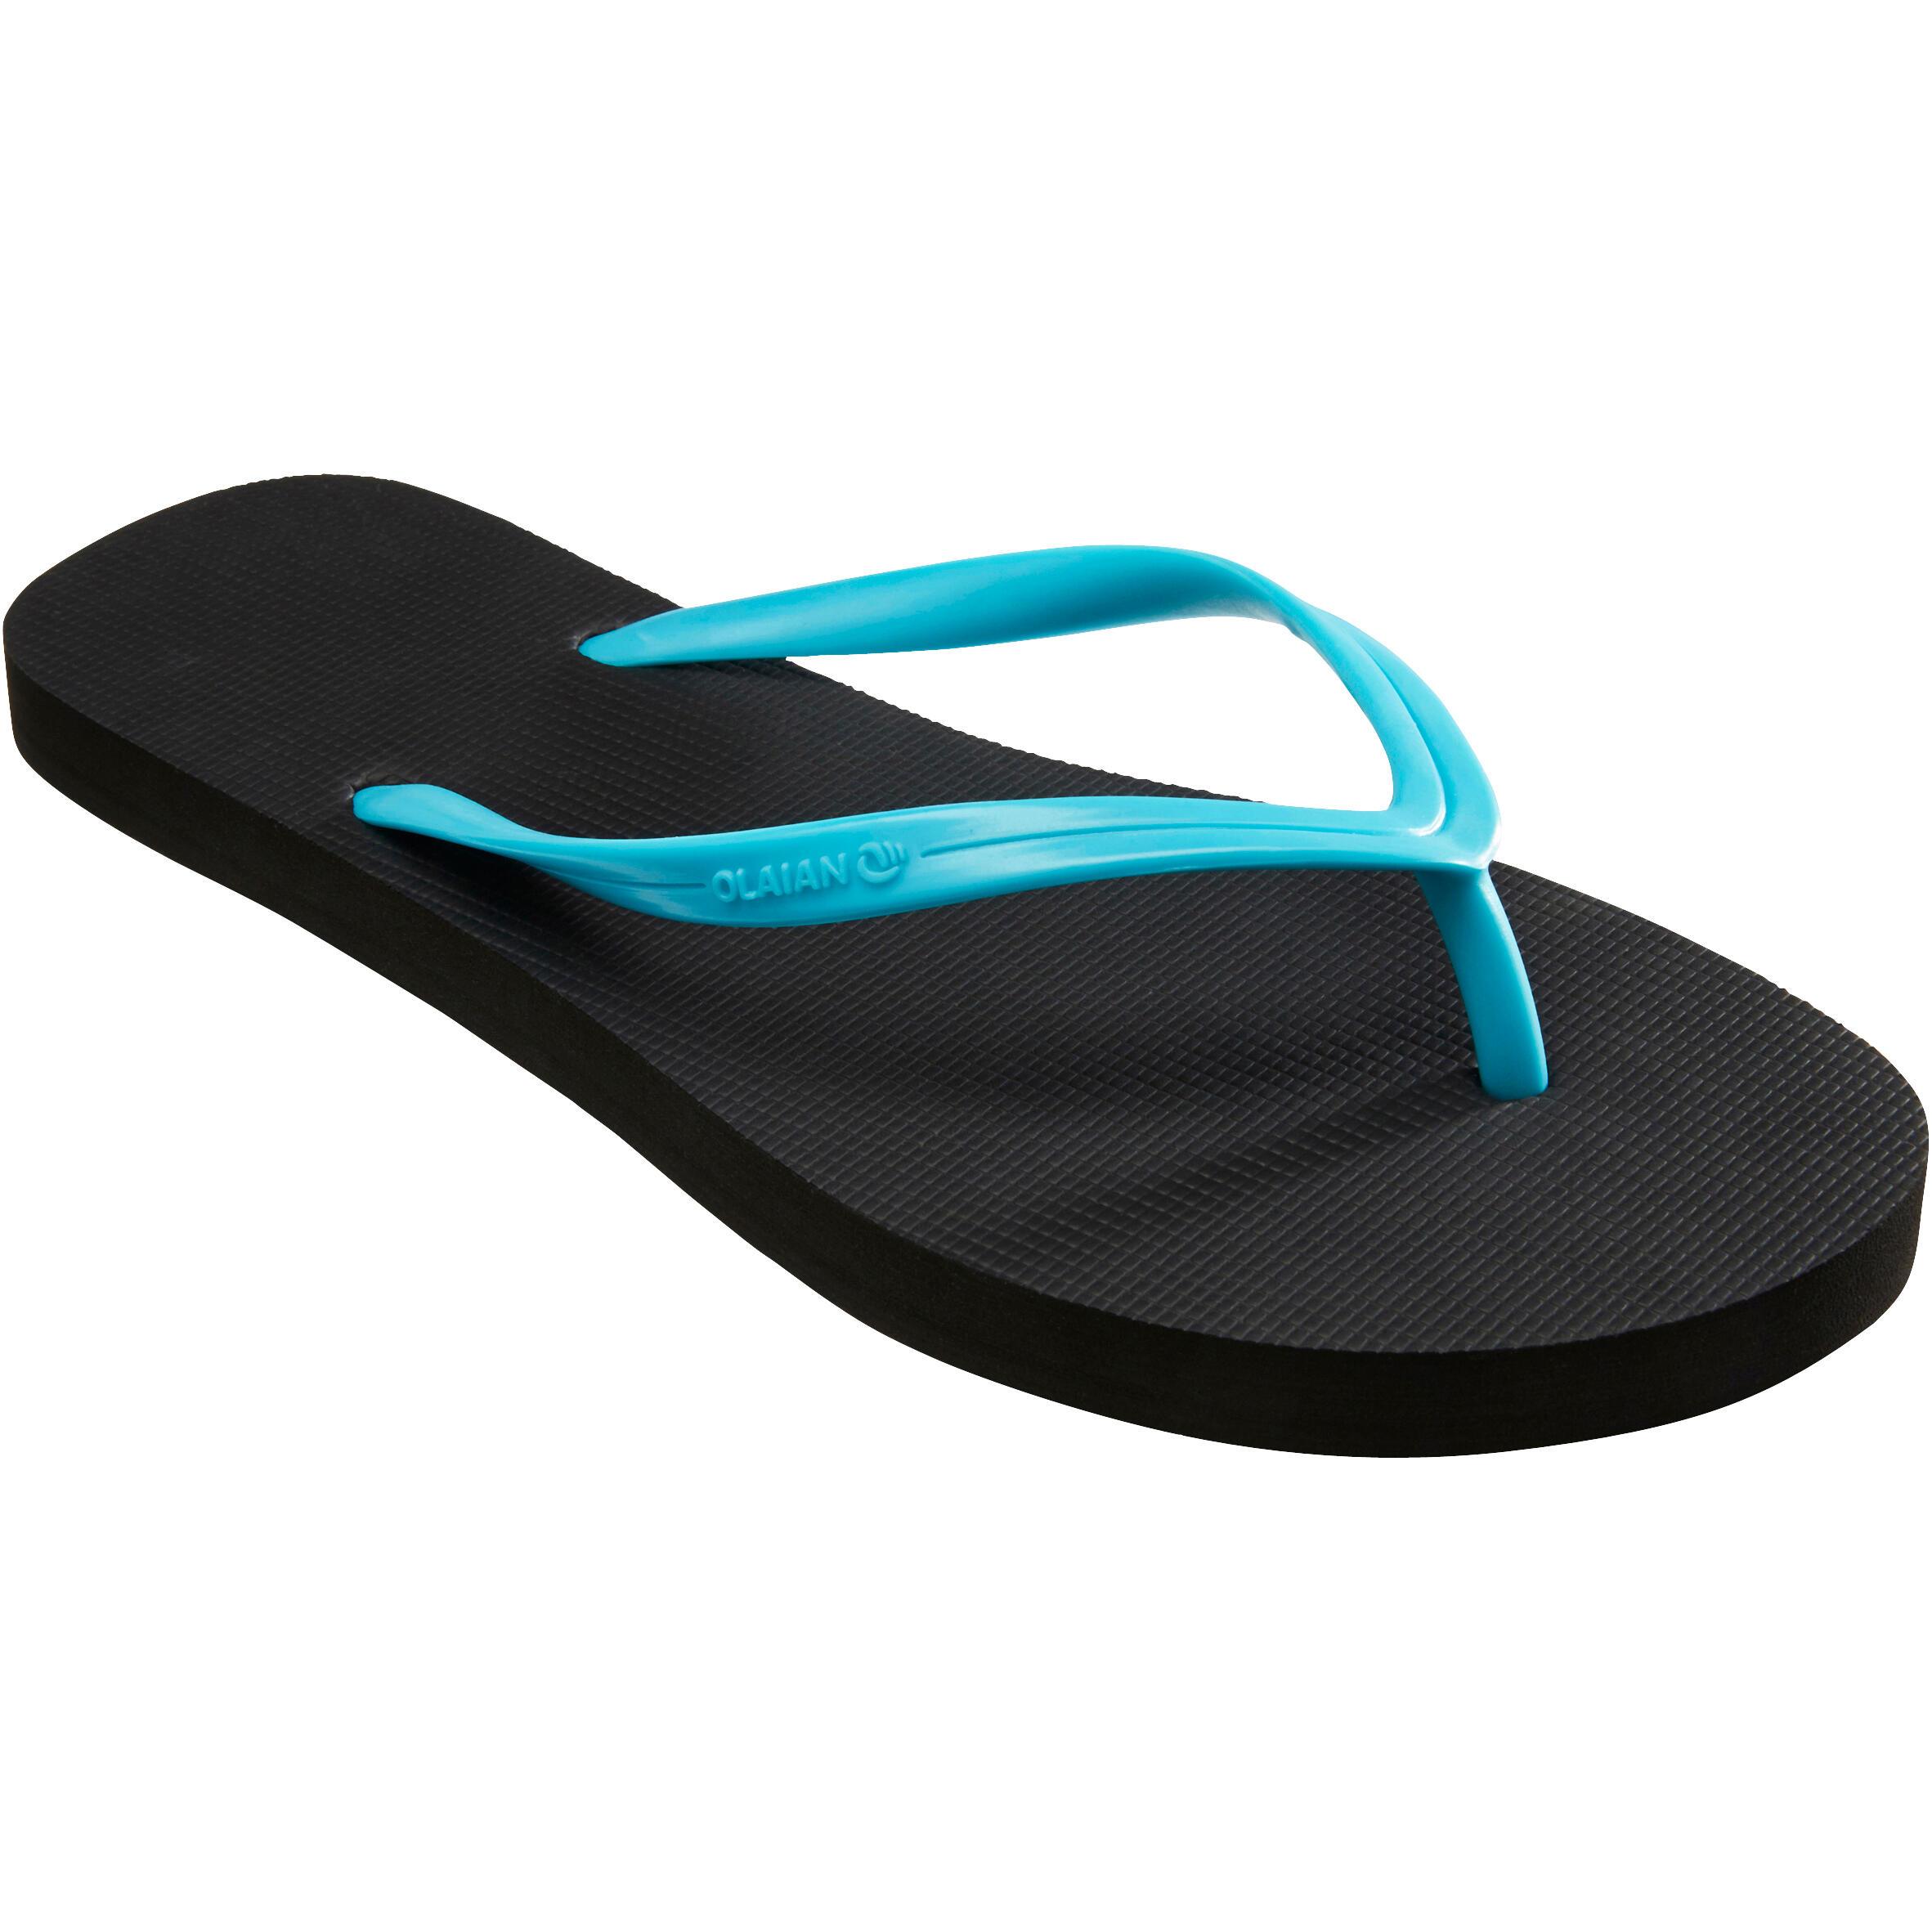 2546160 Olaian Damesslippers TO 50 zwart turquoise